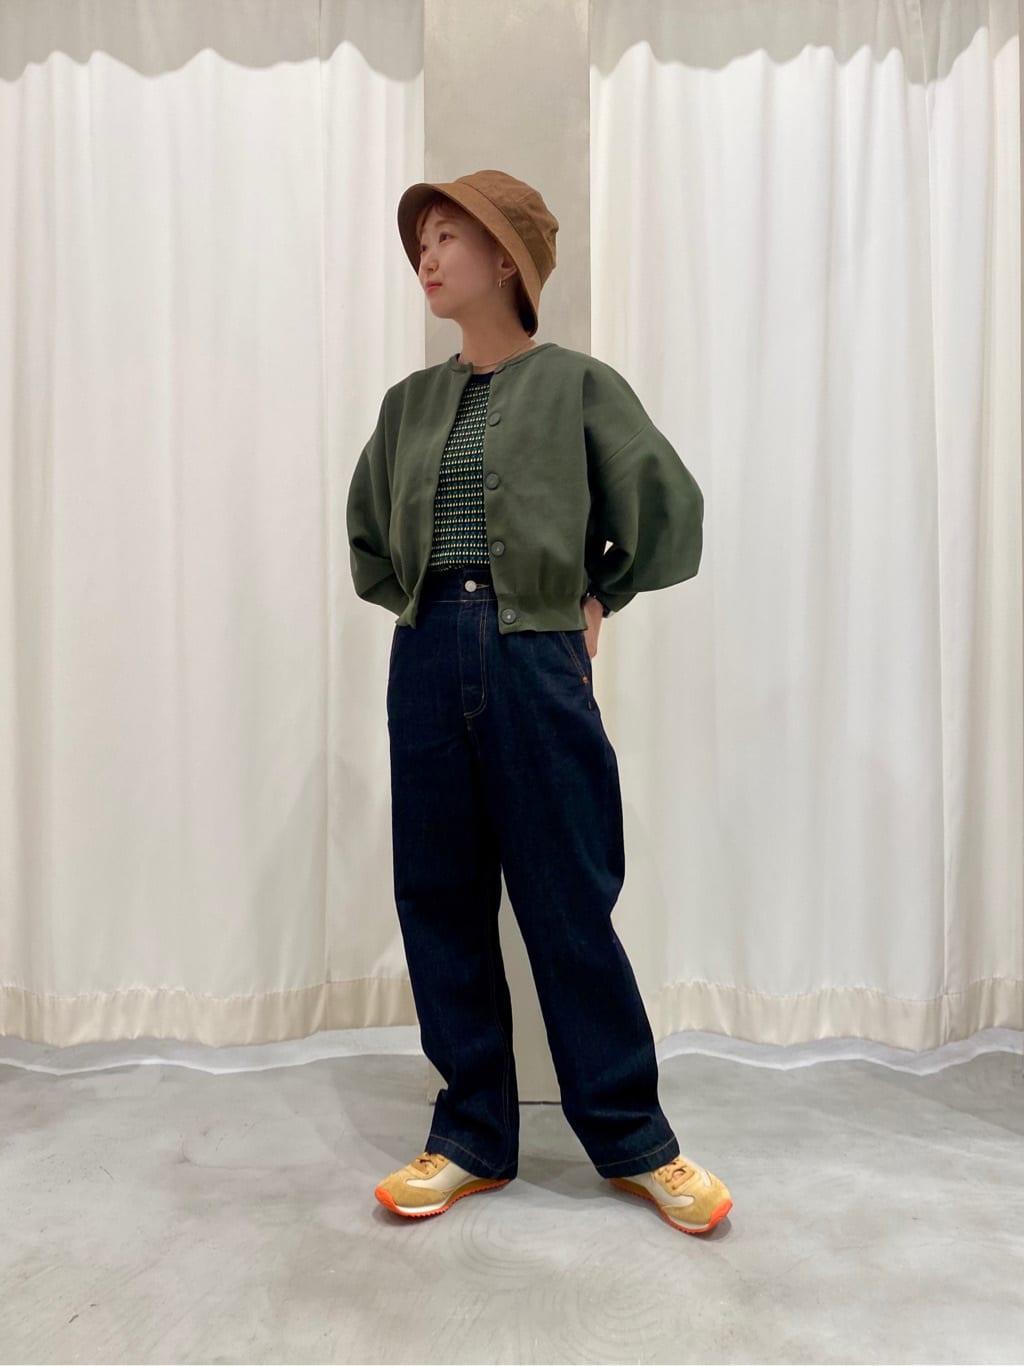 CHILD WOMAN , PAR ICI 東京スカイツリータウン・ソラマチ 2021.08.13